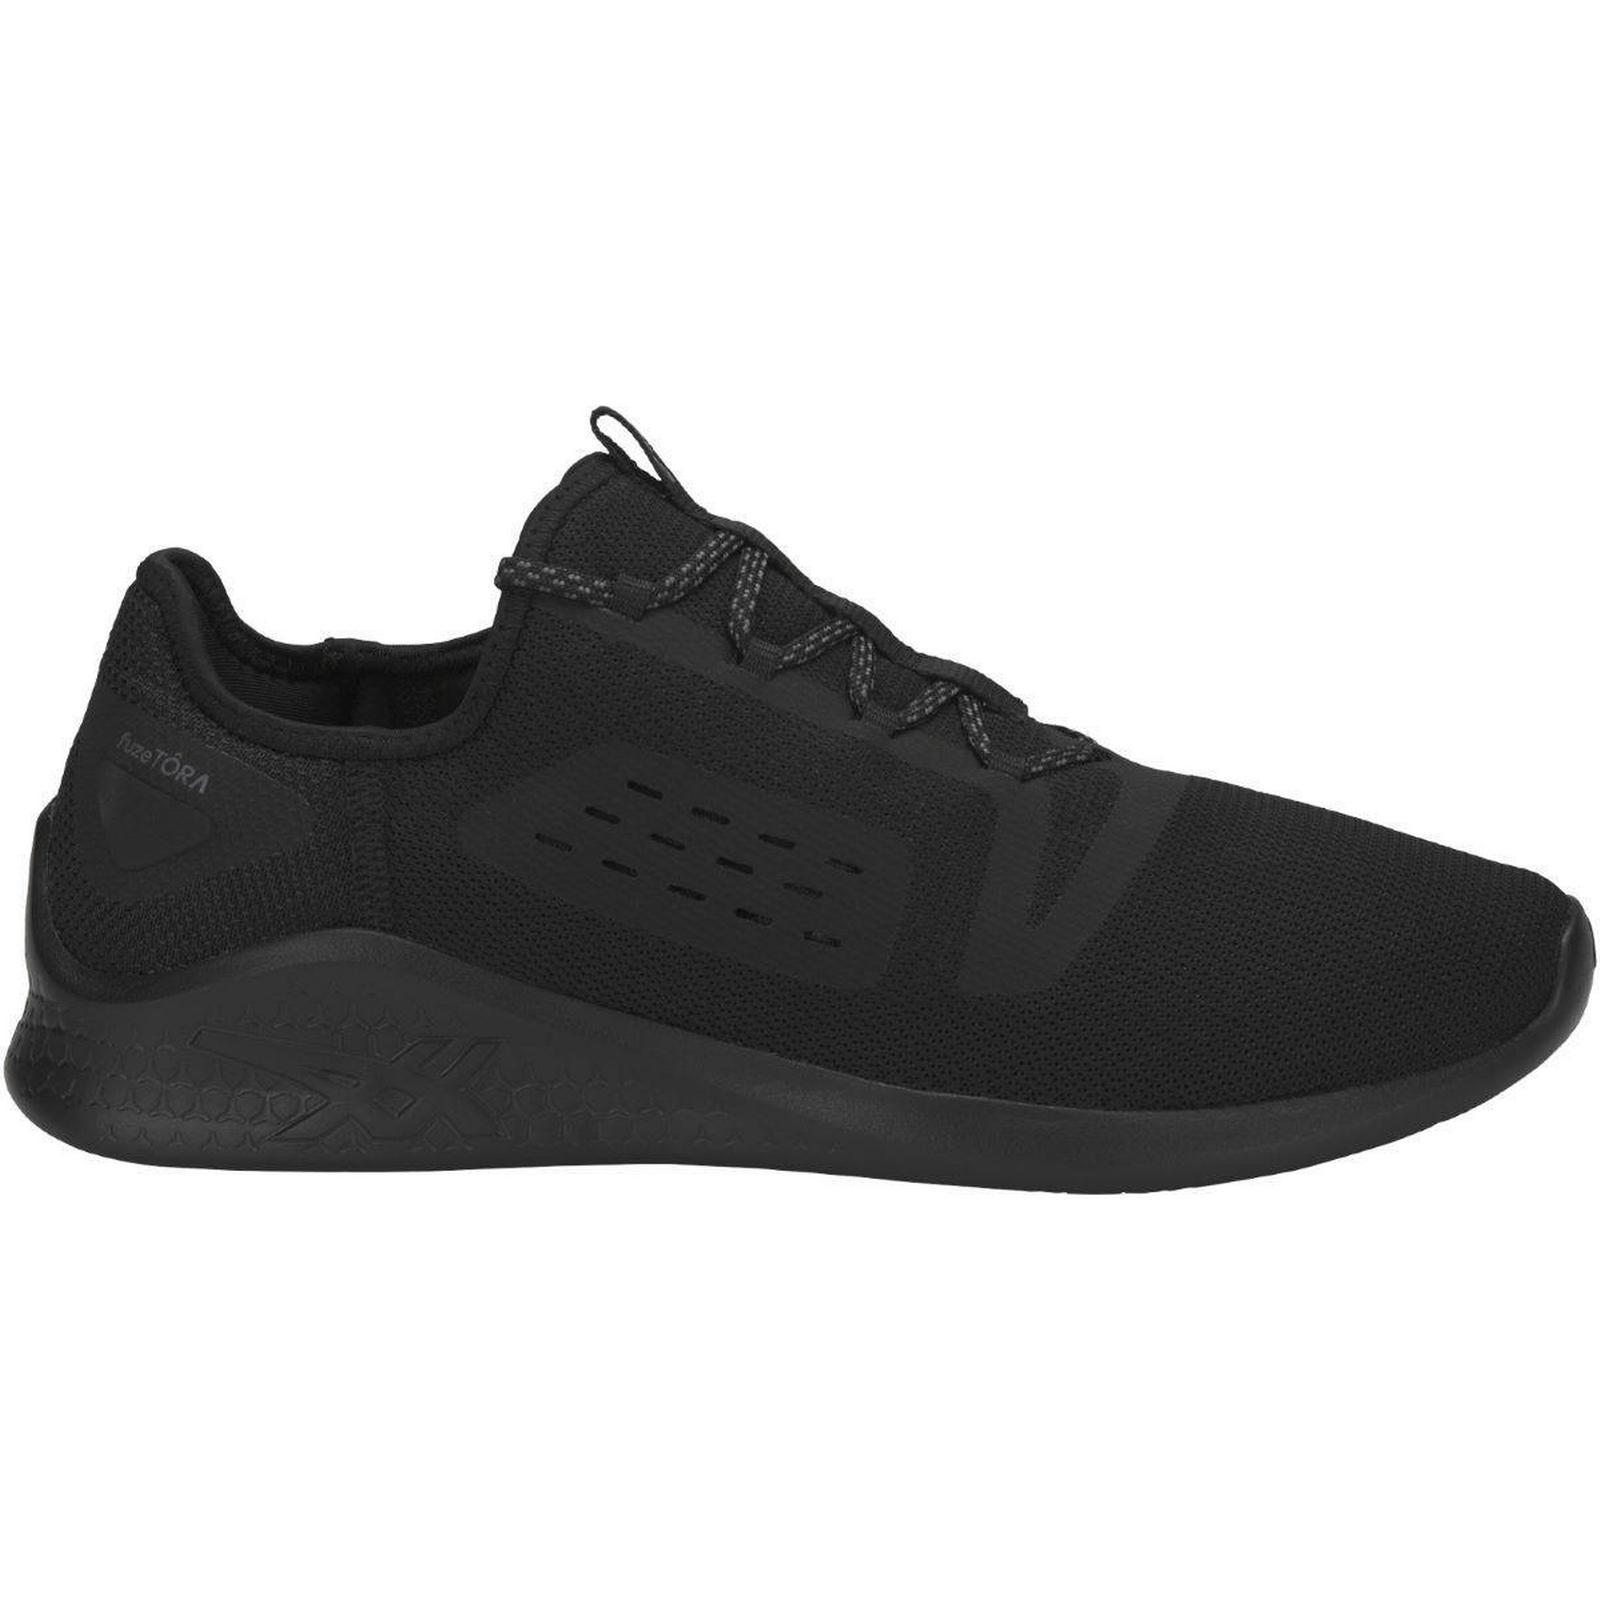 Wiggle Fuzetora Online Cycle Shop Asics Fuzetora Wiggle Shoes Running Shoes 2a6ae2